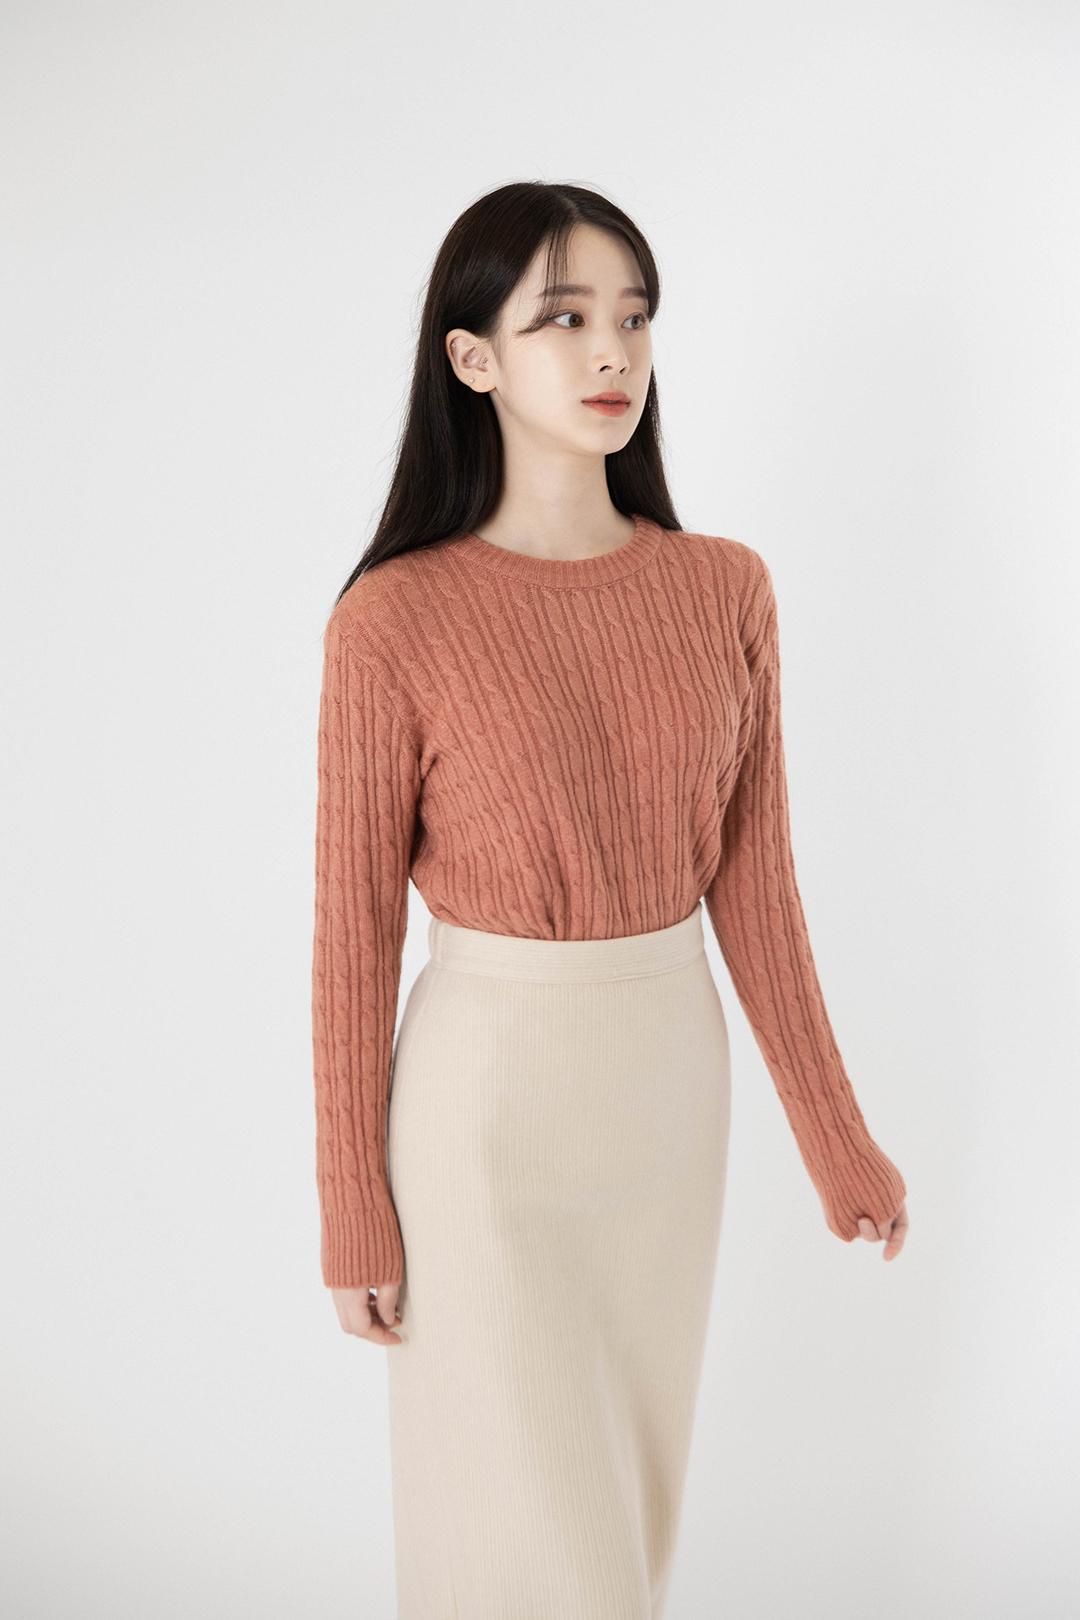 ESSAYBack Slit Mid-Calf Skirt